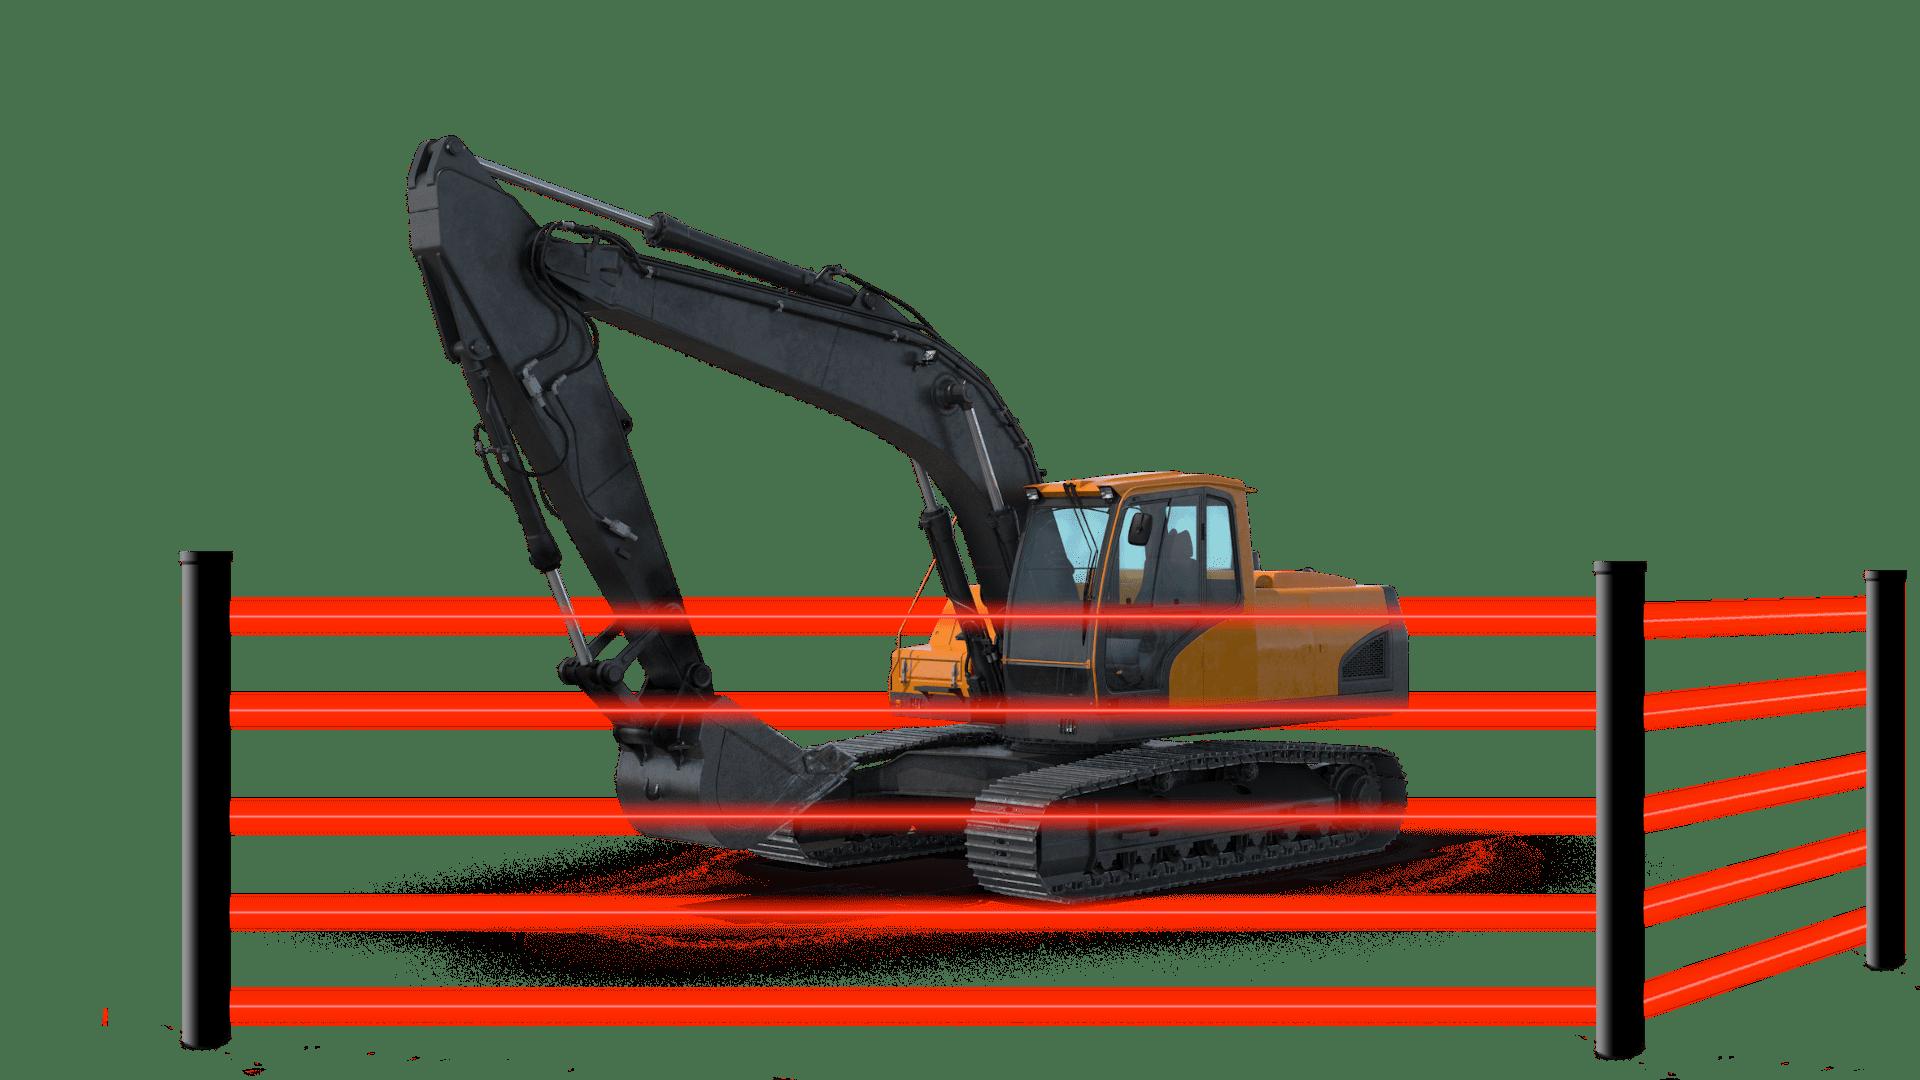 Baustellenüberwachung durch Infrarotzaun